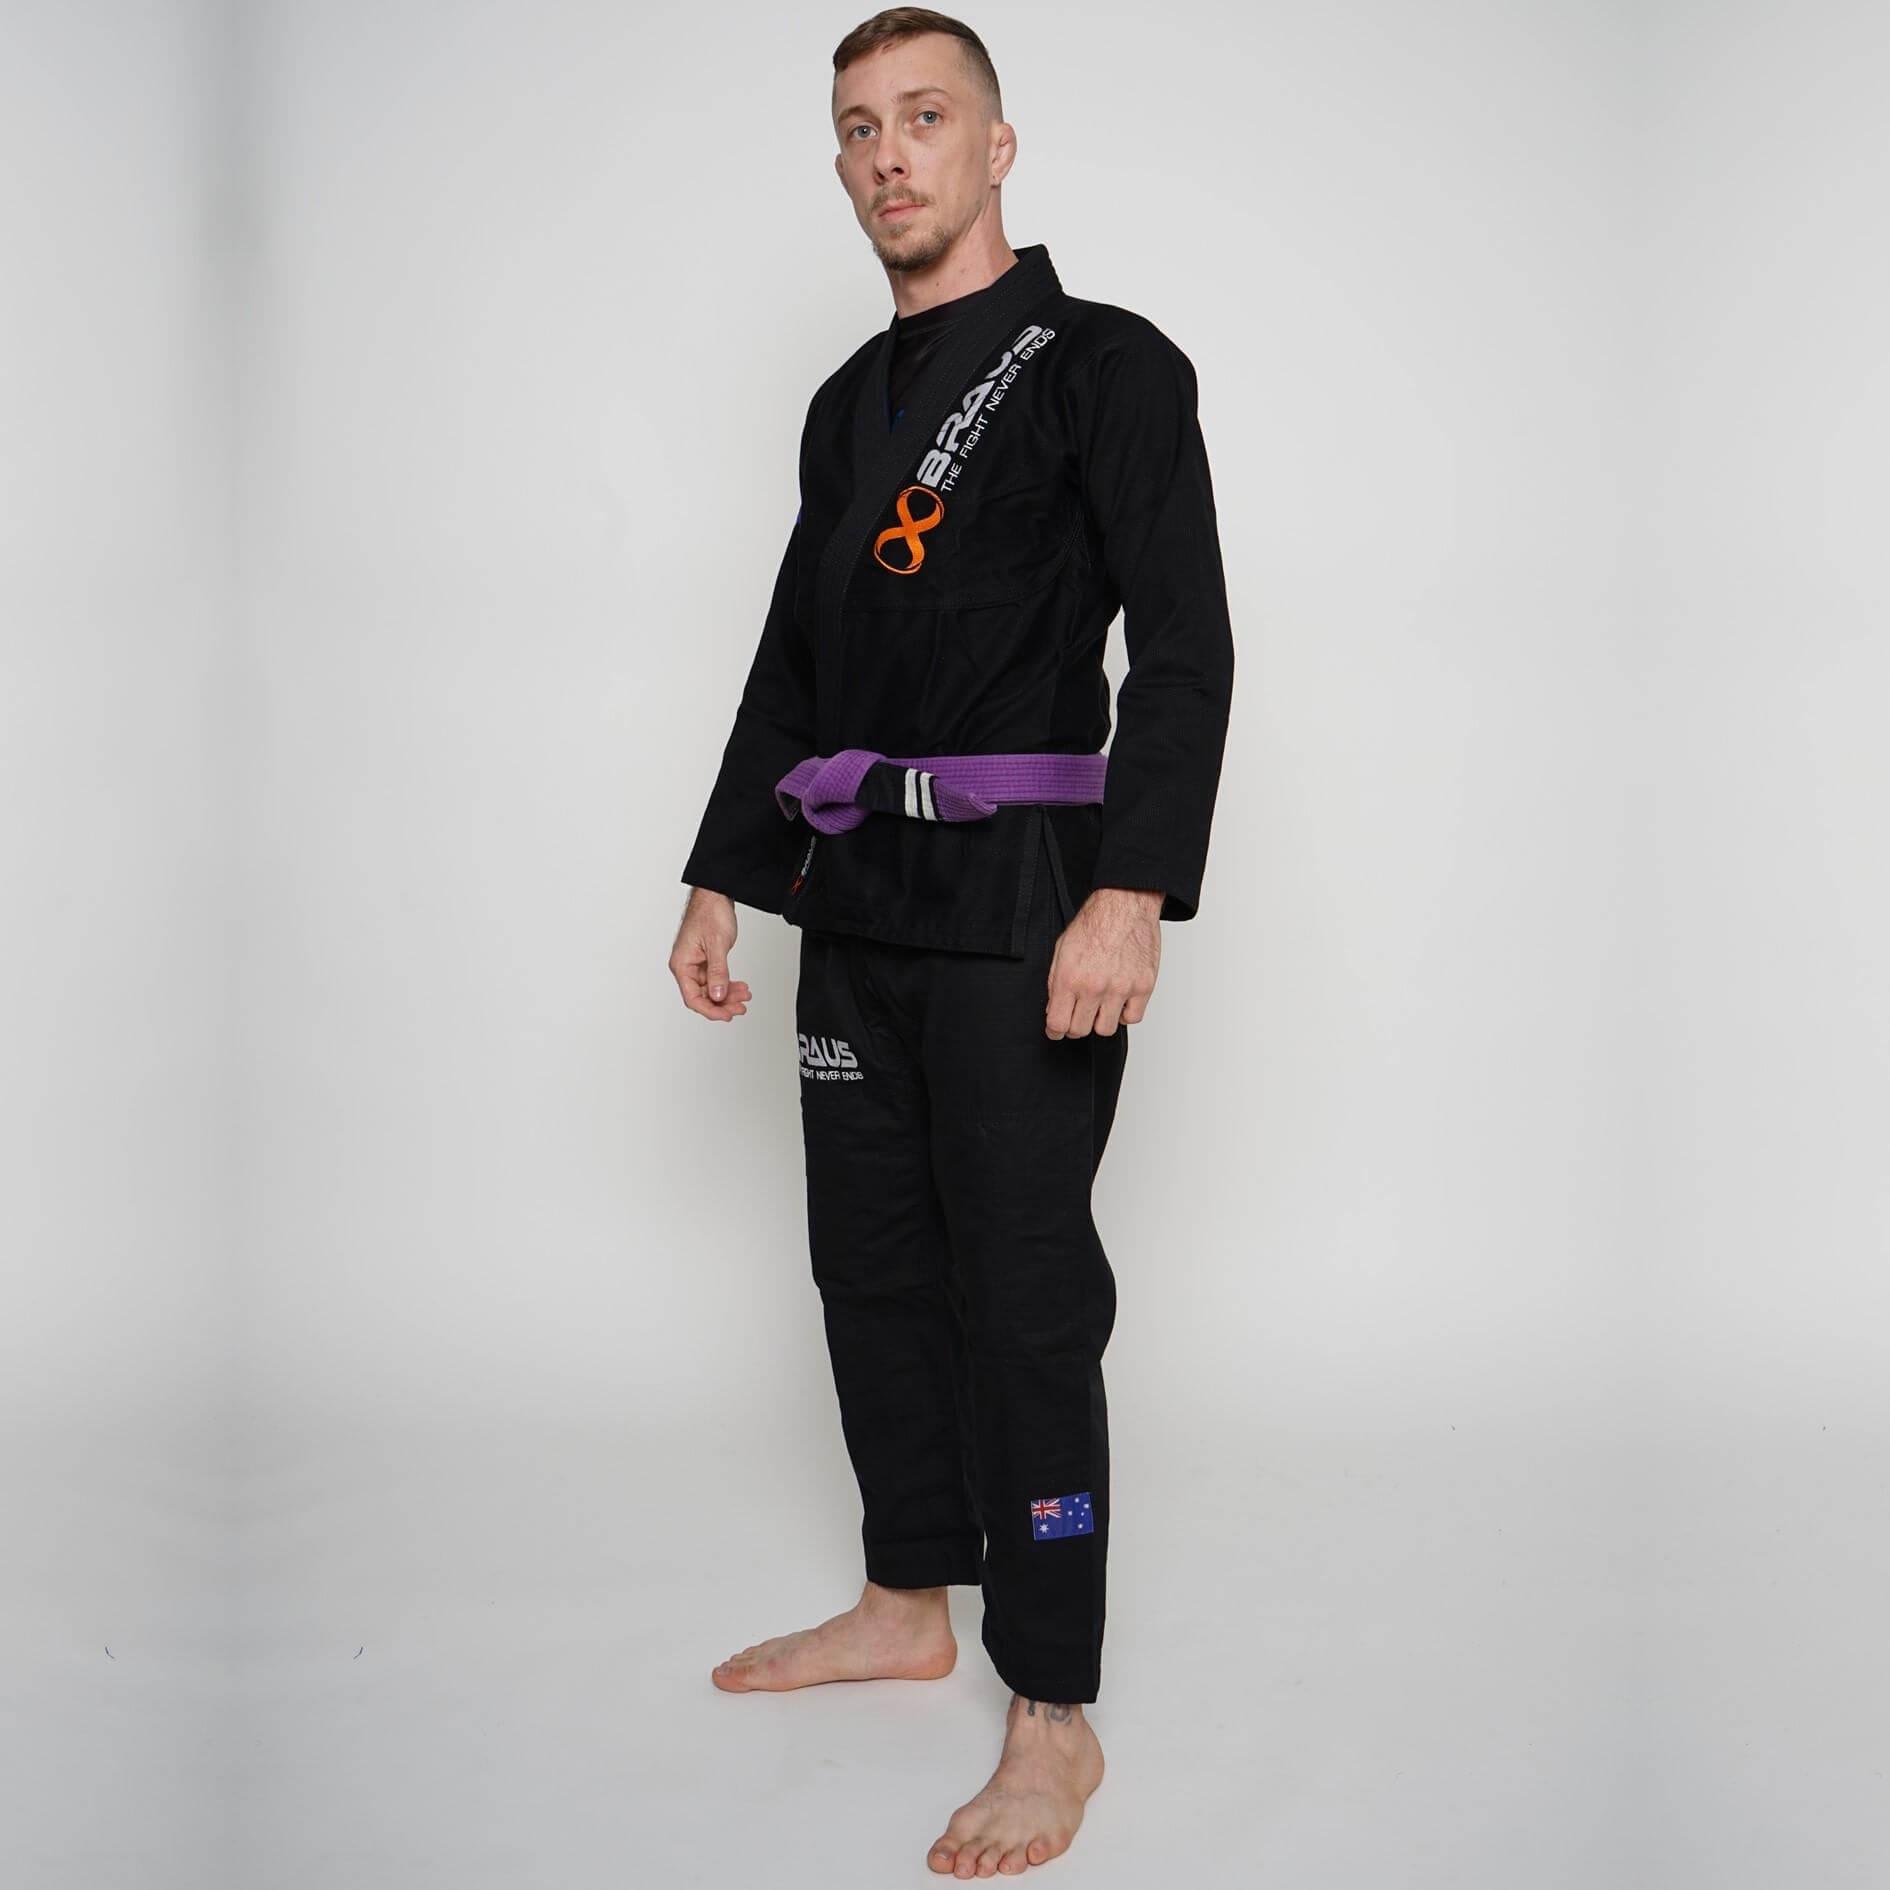 The 5 Best Jiu Jitsu Christmas Gifts